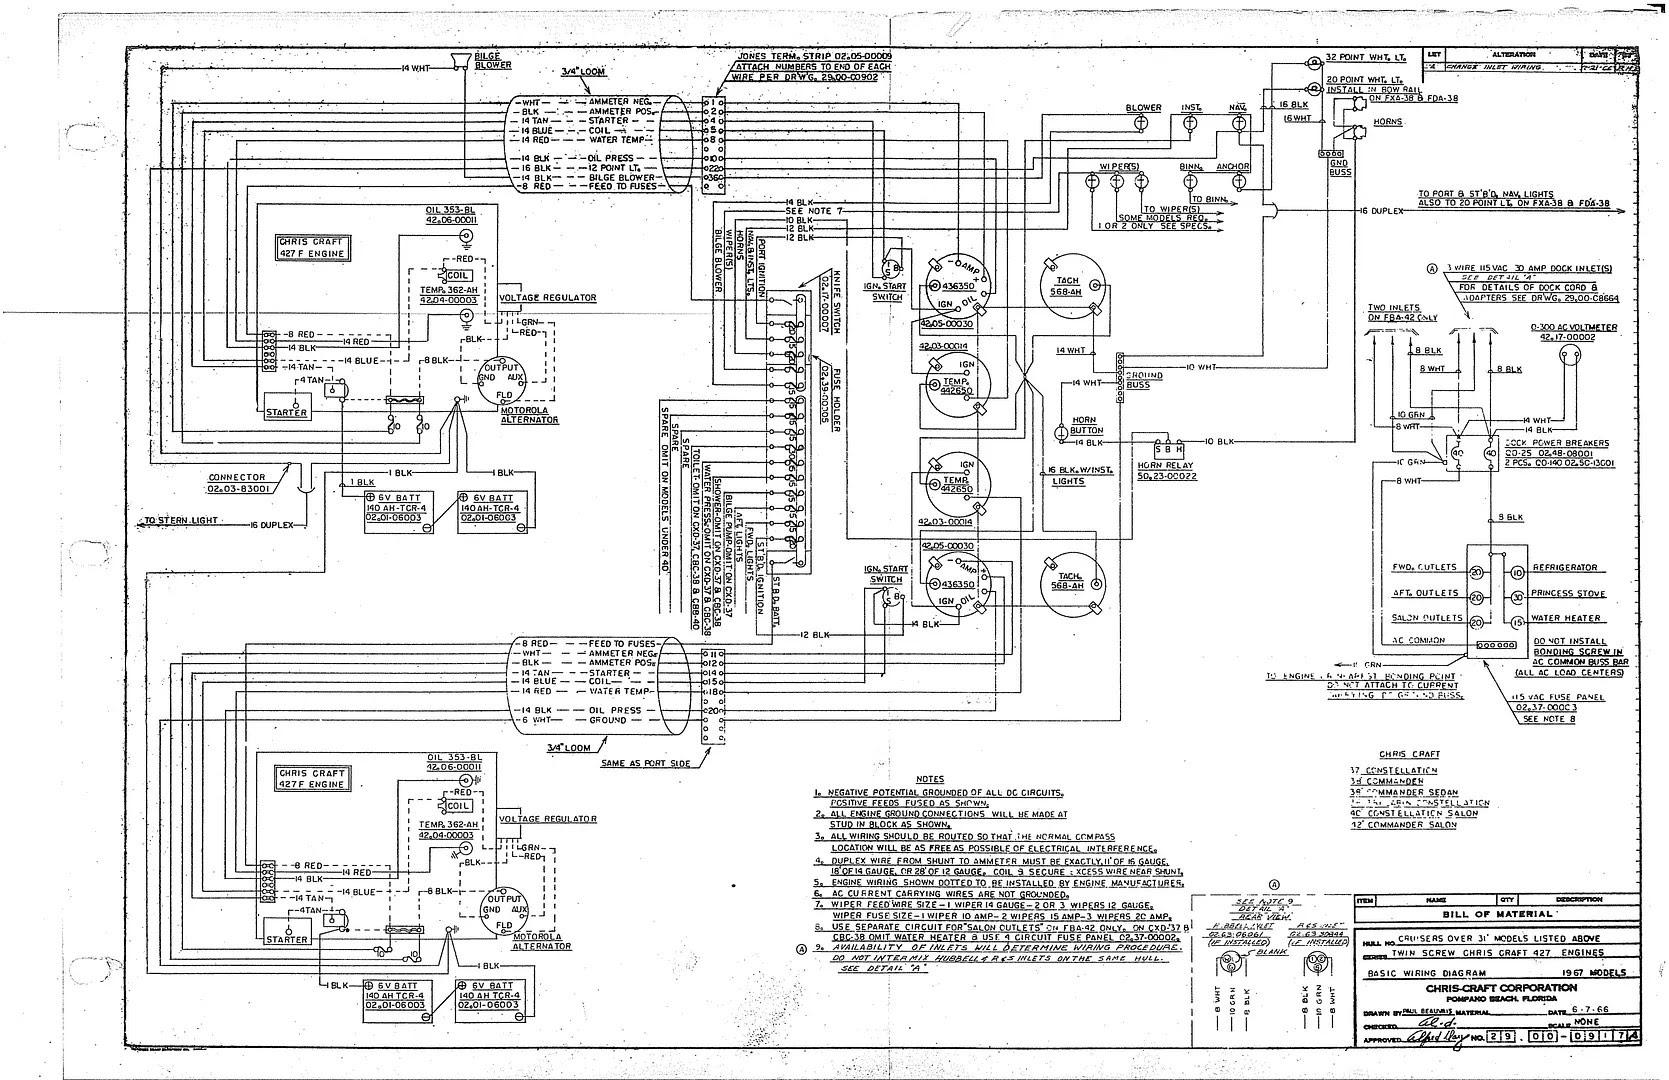 Diagram 1996 Lowe Boat Wiring Diagram Full Version Hd Quality Wiring Diagram Premierewiringm Repni It